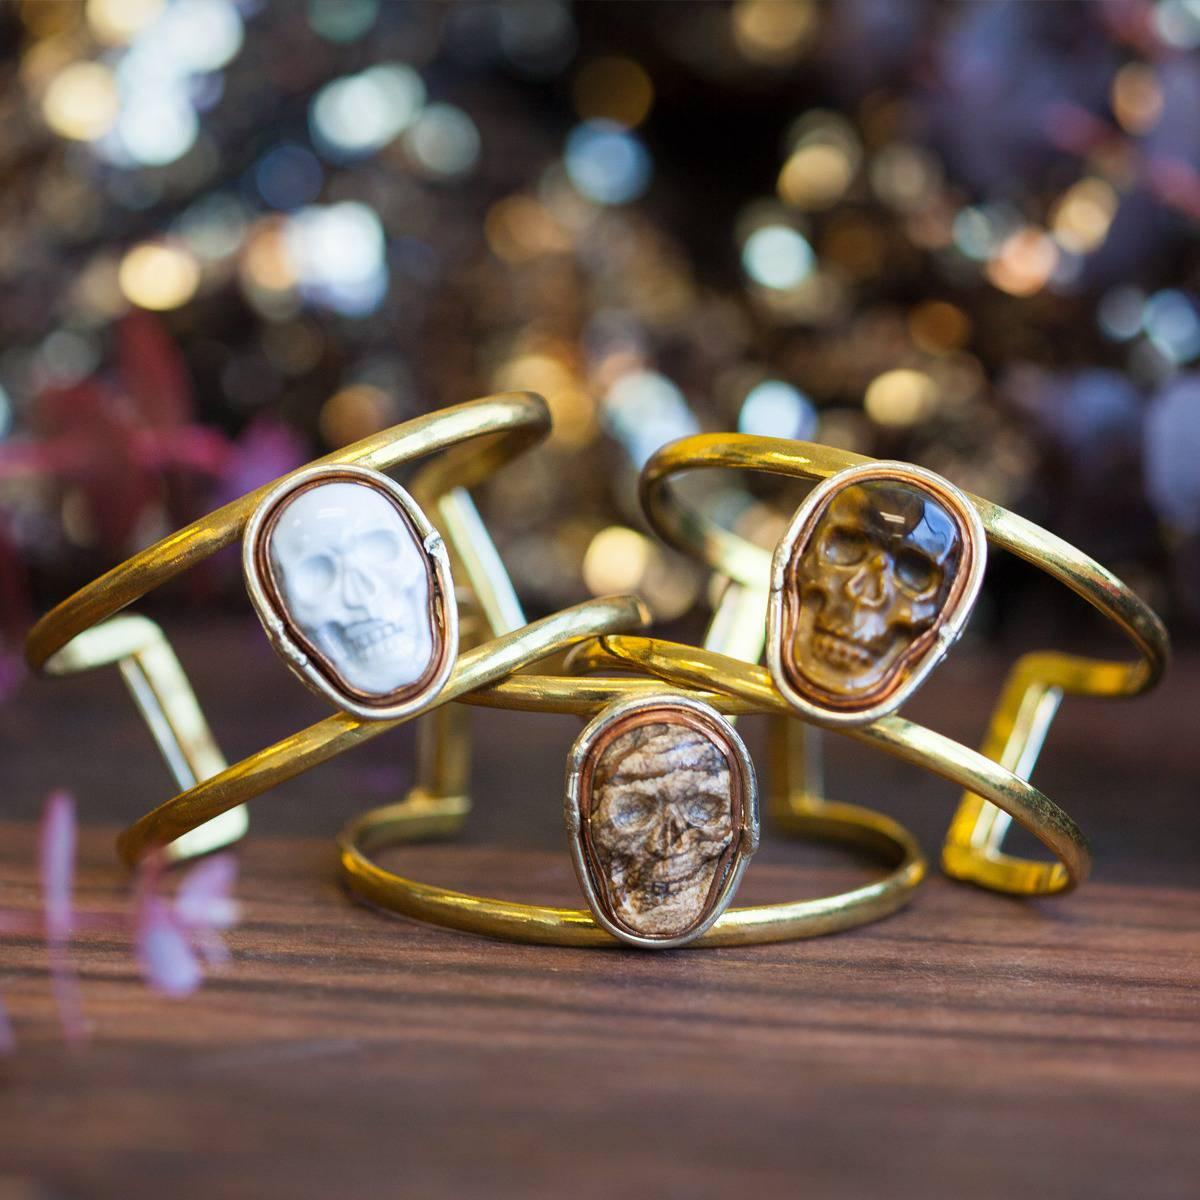 Gemstone Skull Cuff Bracelets 5_23